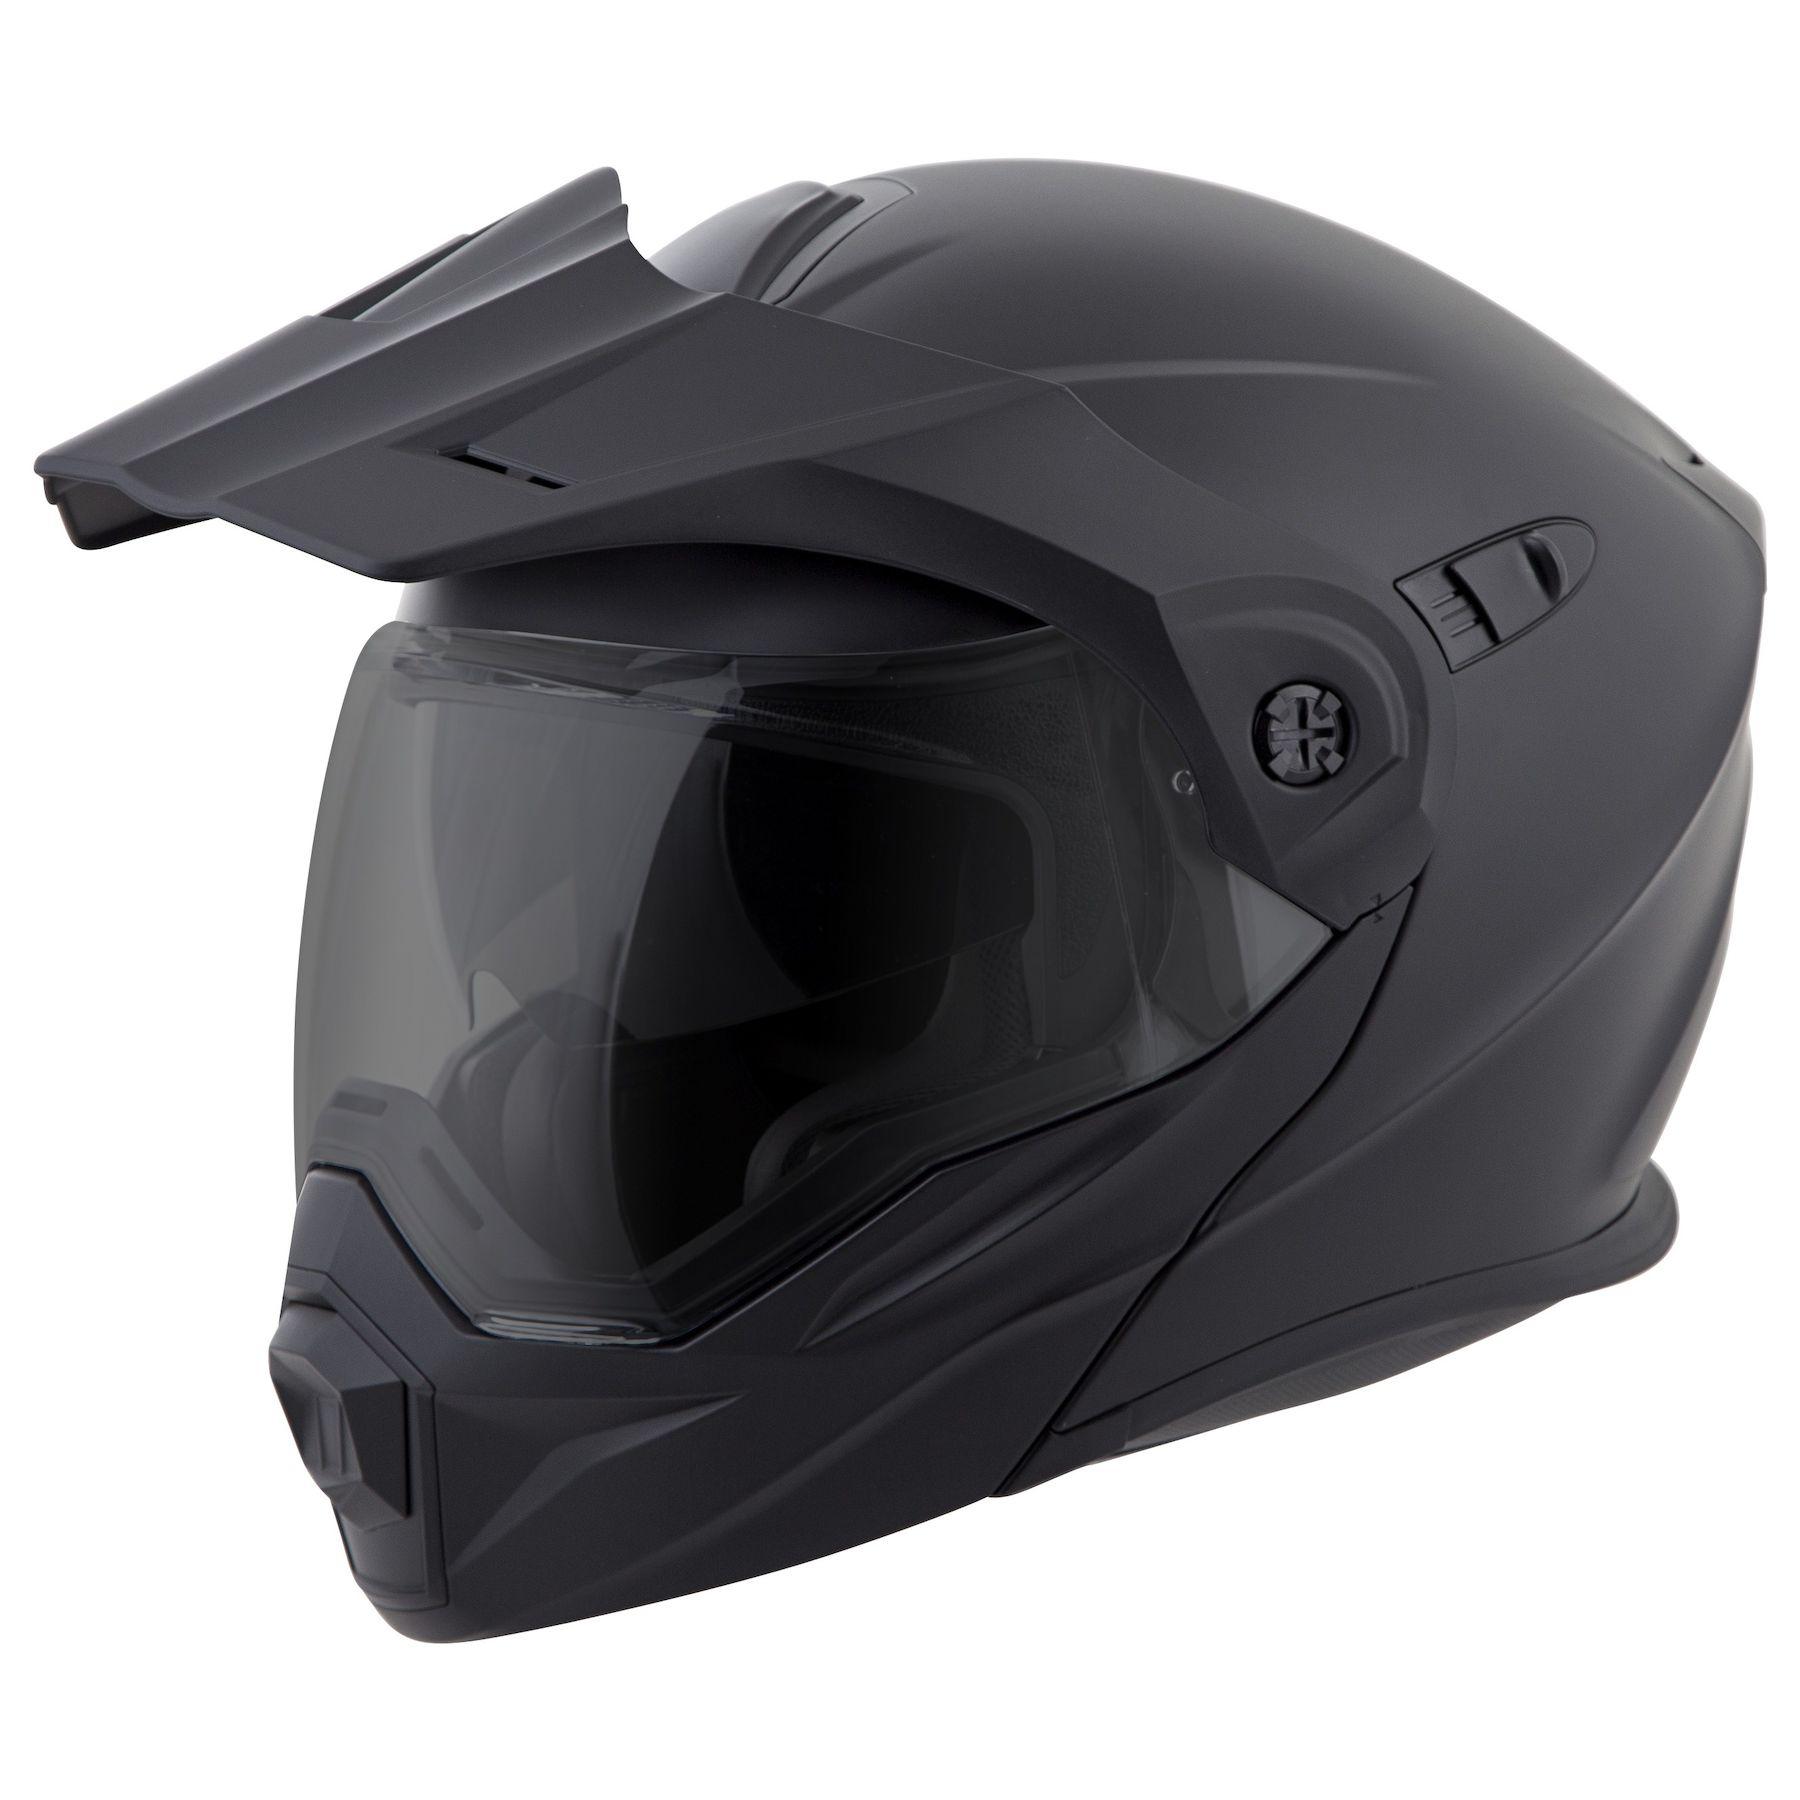 Matte Black//One Size Scorpion Peak Visor Exo-AT950 Motorcycle Helmet Accessories